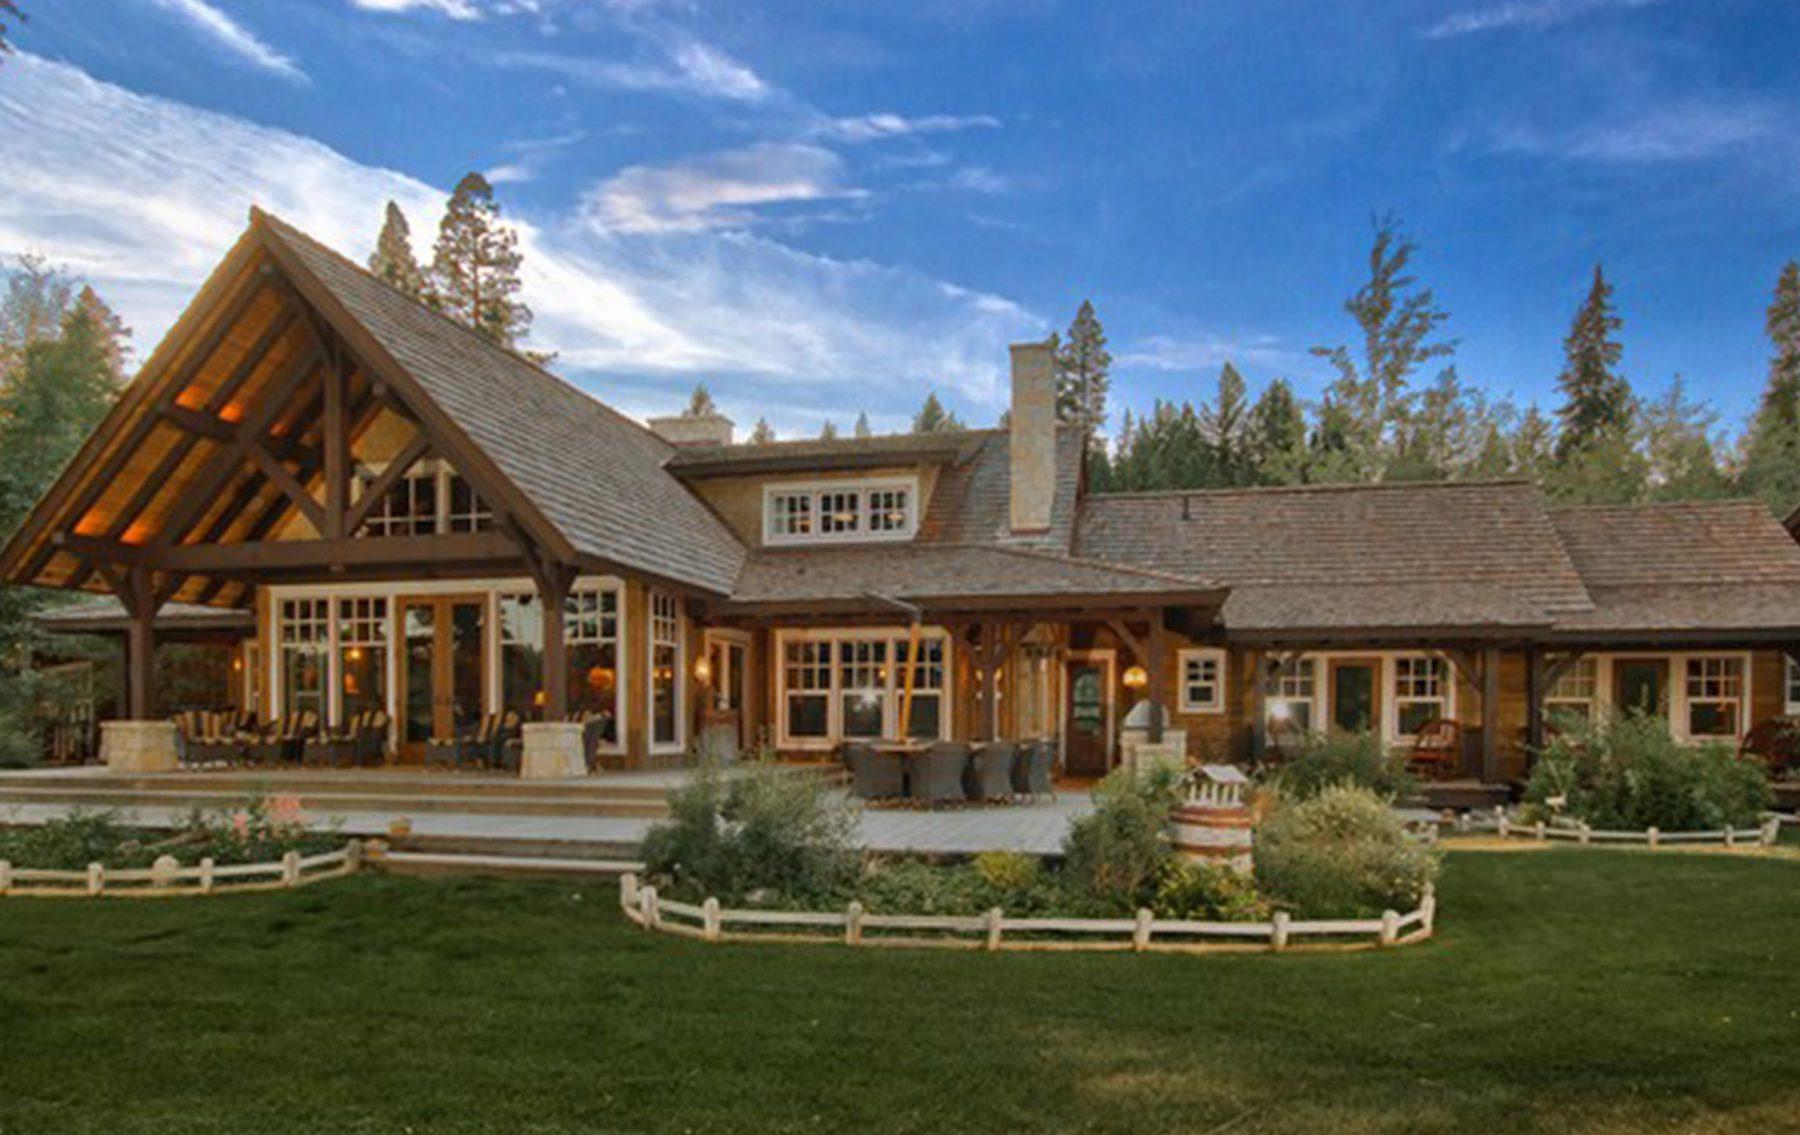 Turner Ranch